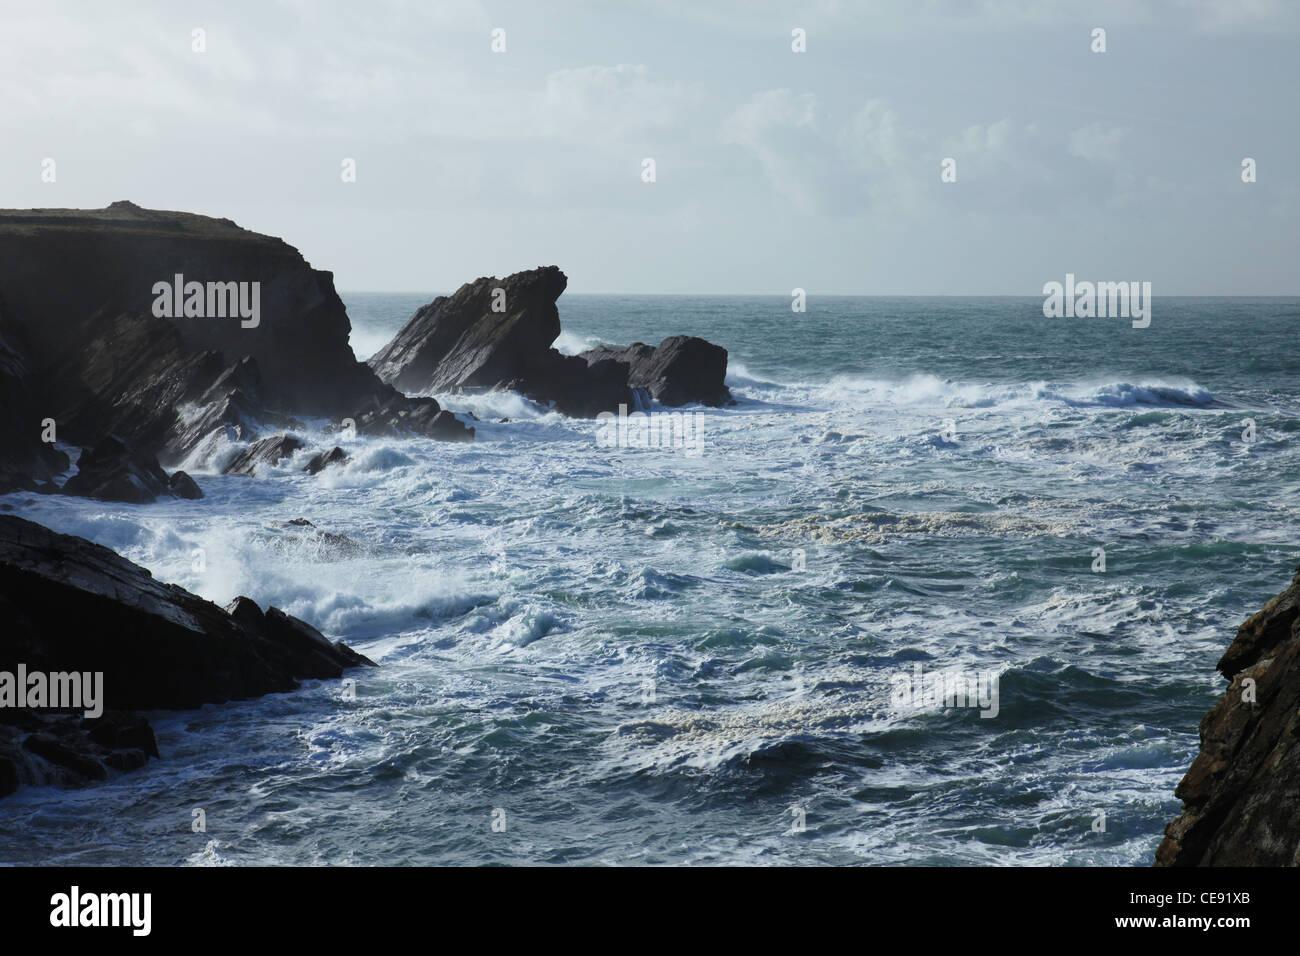 ireland, co,  kerry, dingle peninsula, west coast, beauty in nature, wild atlantic way - Stock Image